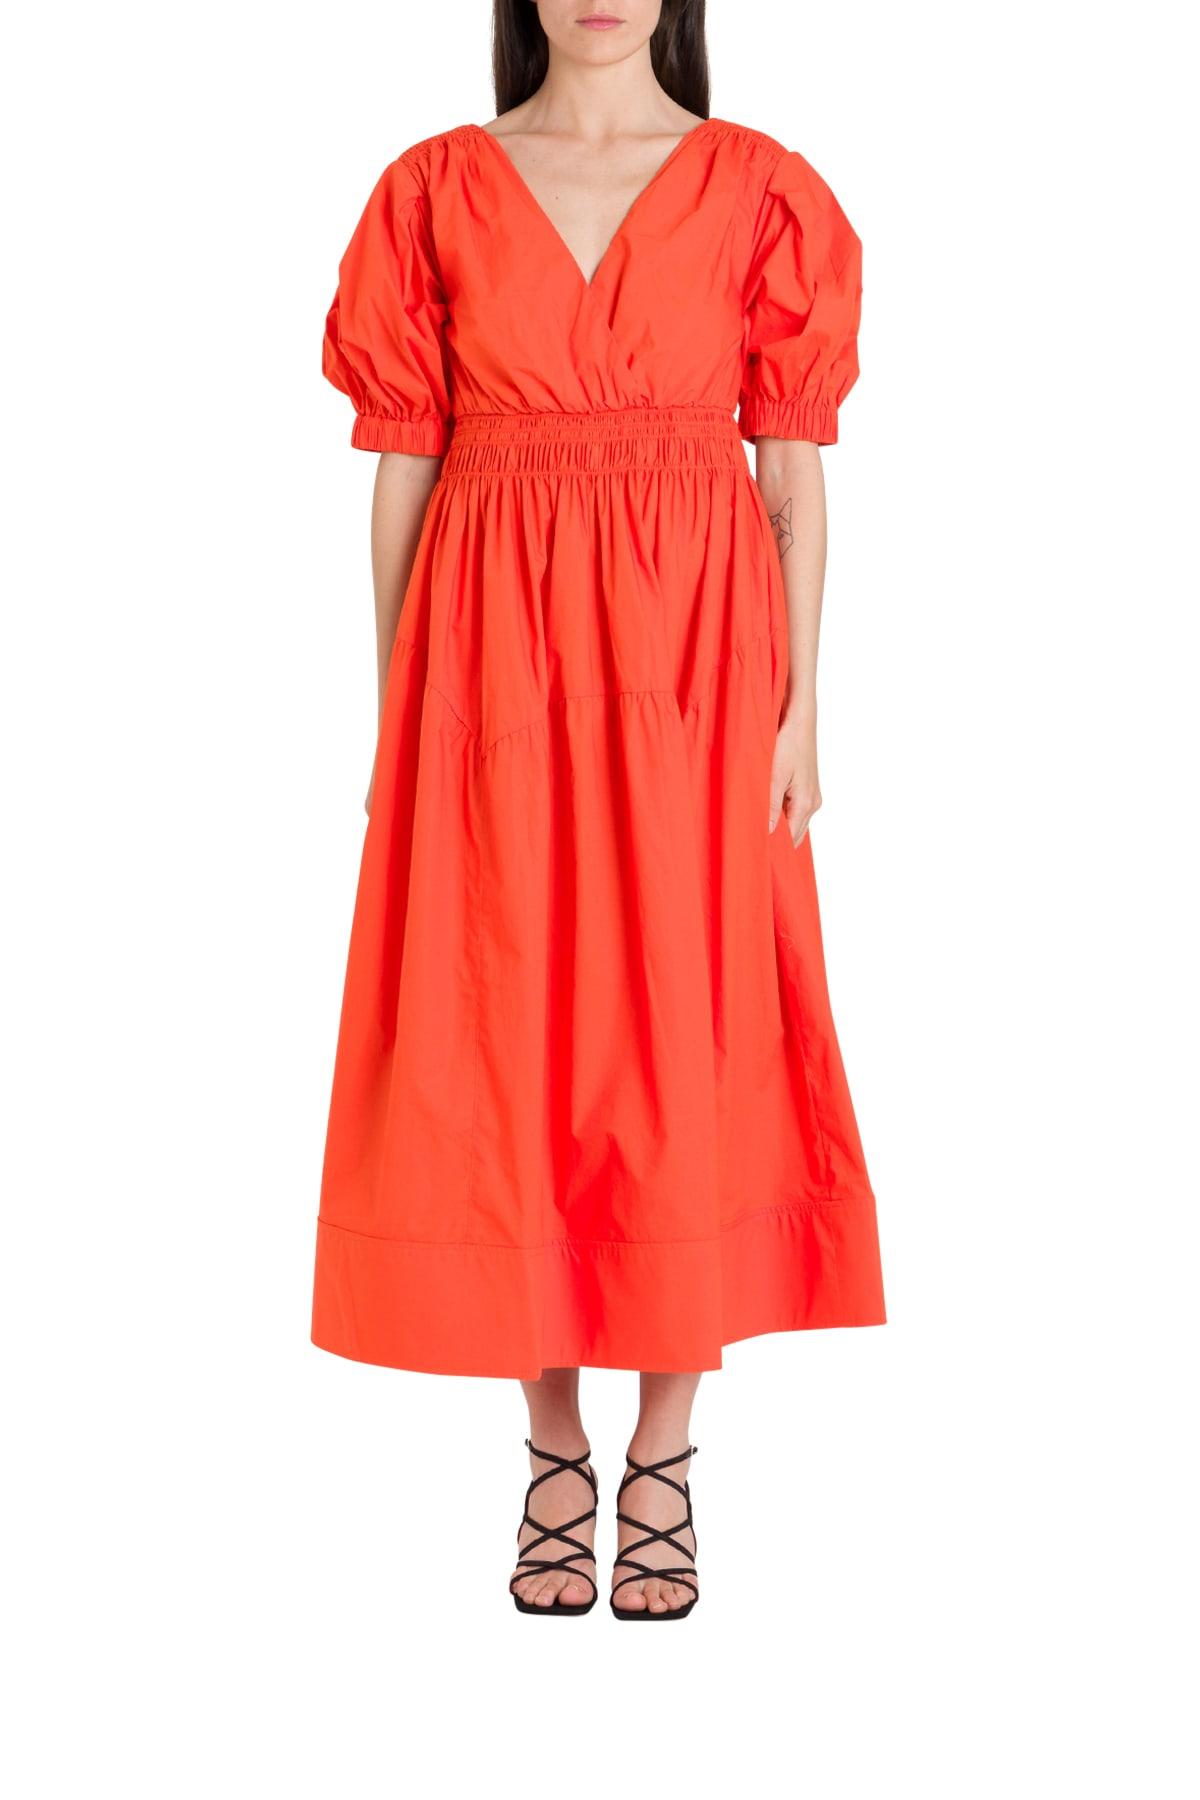 Buy self-portrait Orange Cotton Poplin Midi Dress online, shop self-portrait with free shipping